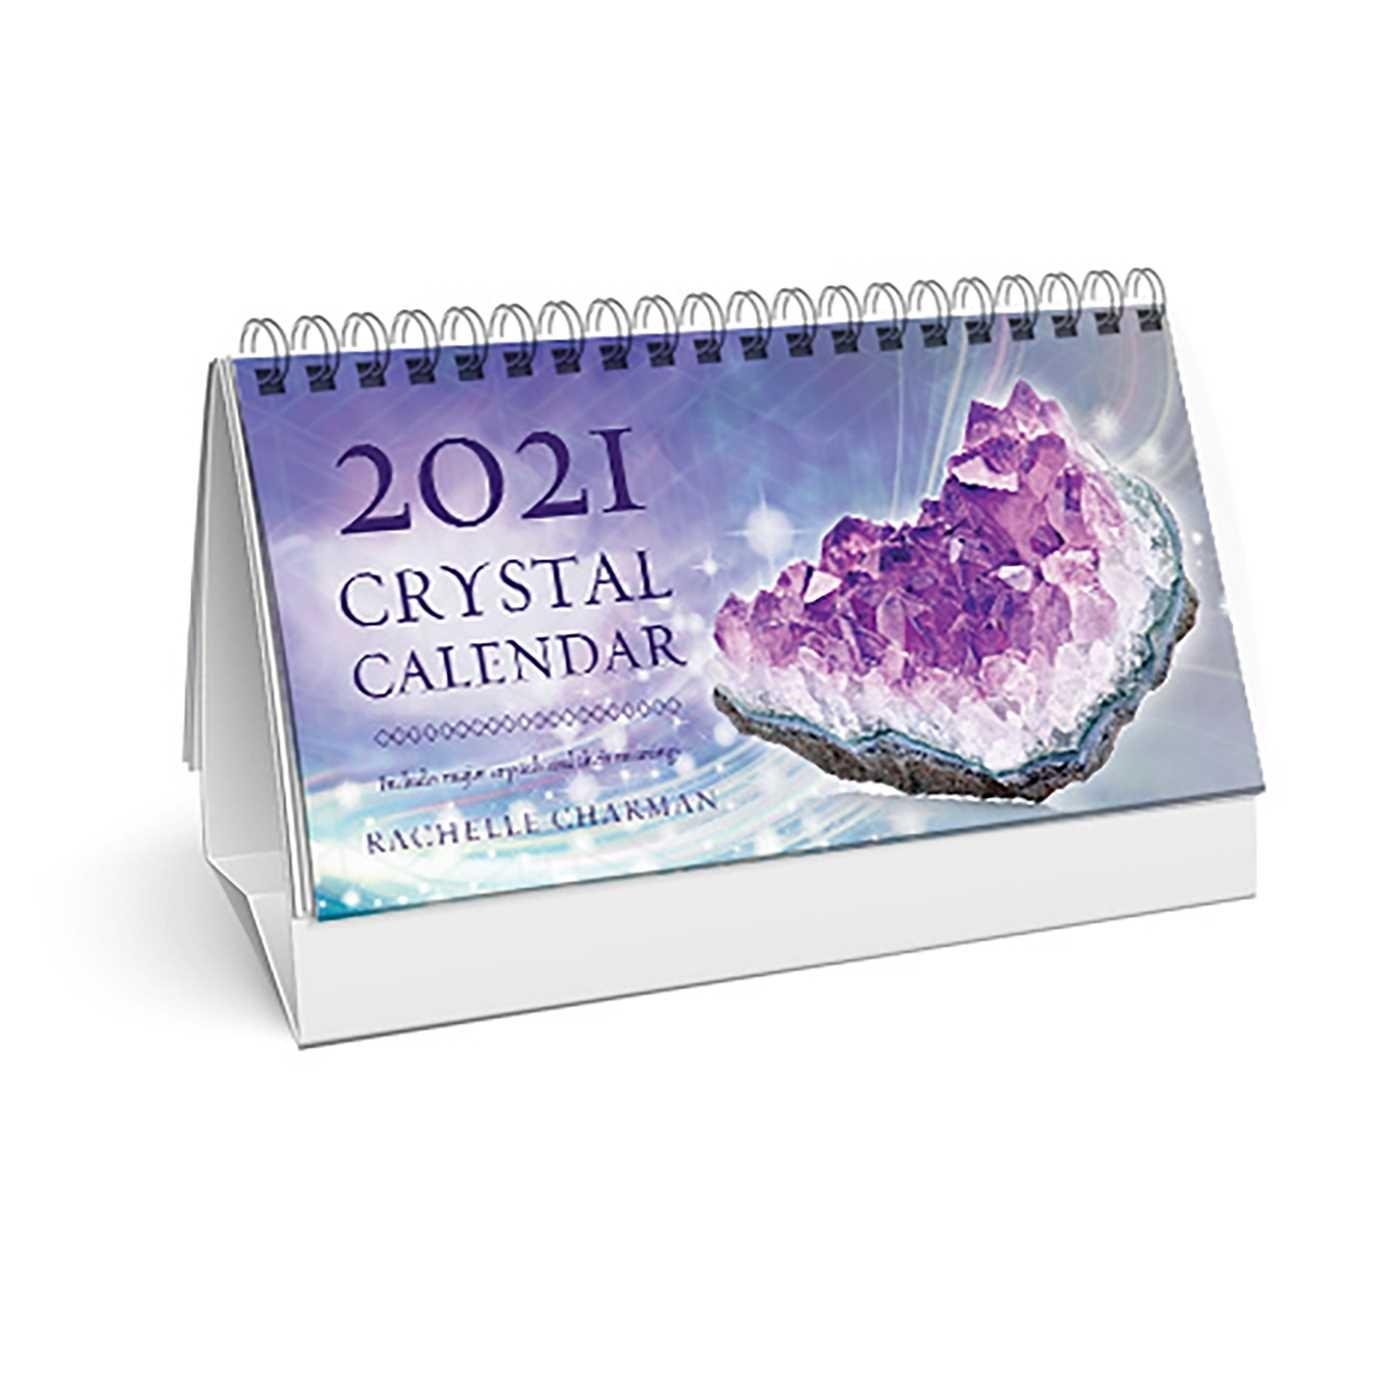 2021 Crystal Calendar - Book Summary & Video | Official